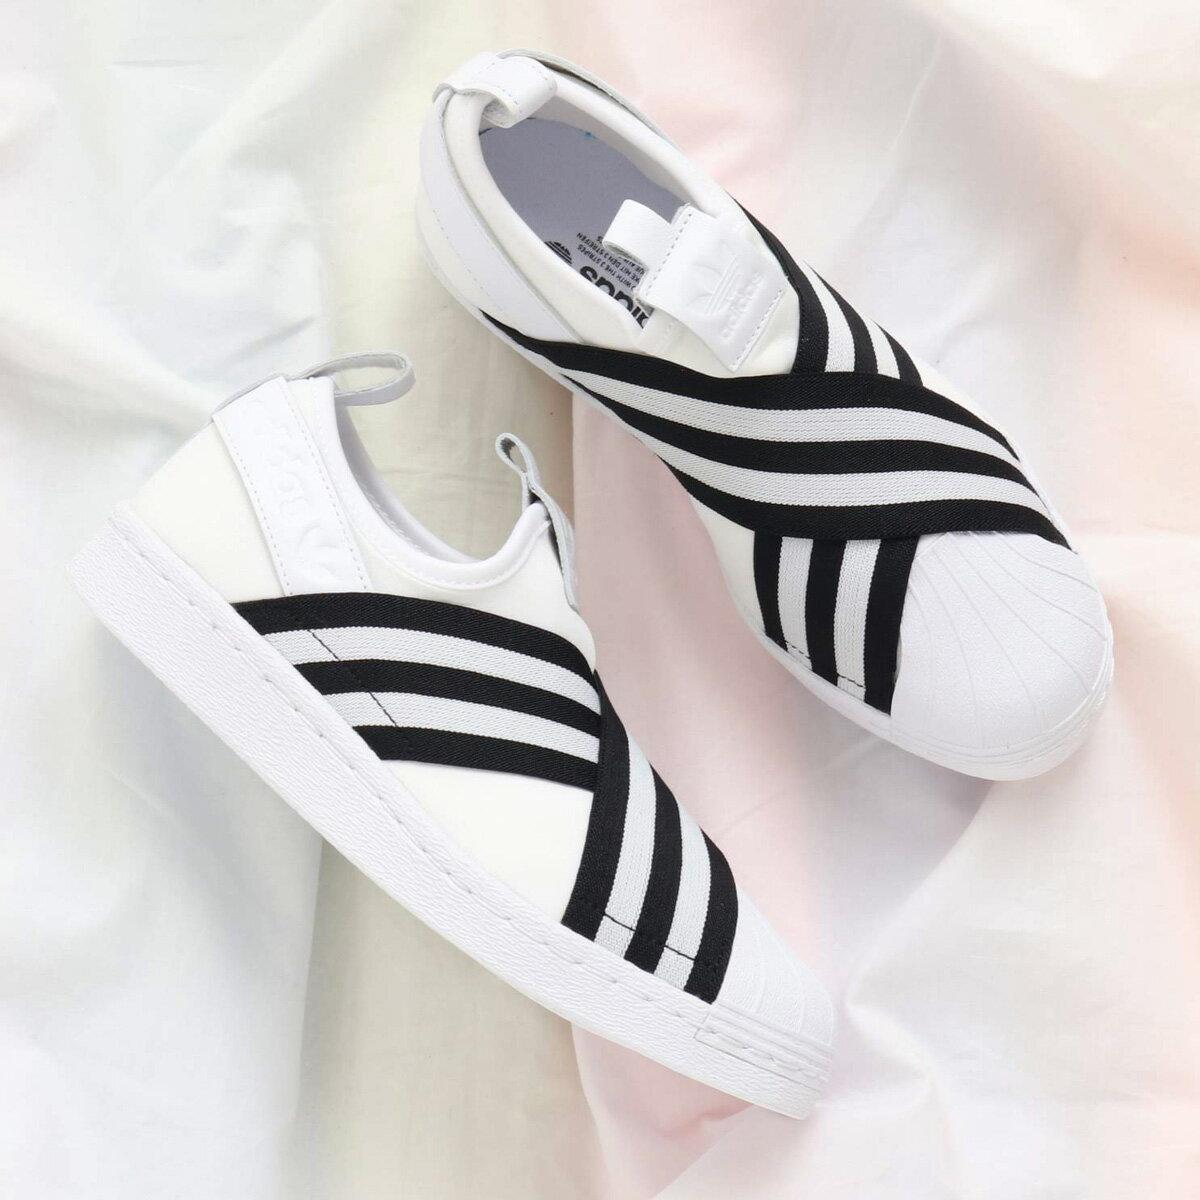 adidas Originals SUPERSTAR SLIPON W(アディダス オリジナルス スーパースタースリッポン W)Running White/Running White/Core Black【メンズ レディース スニーカー】18SS-I